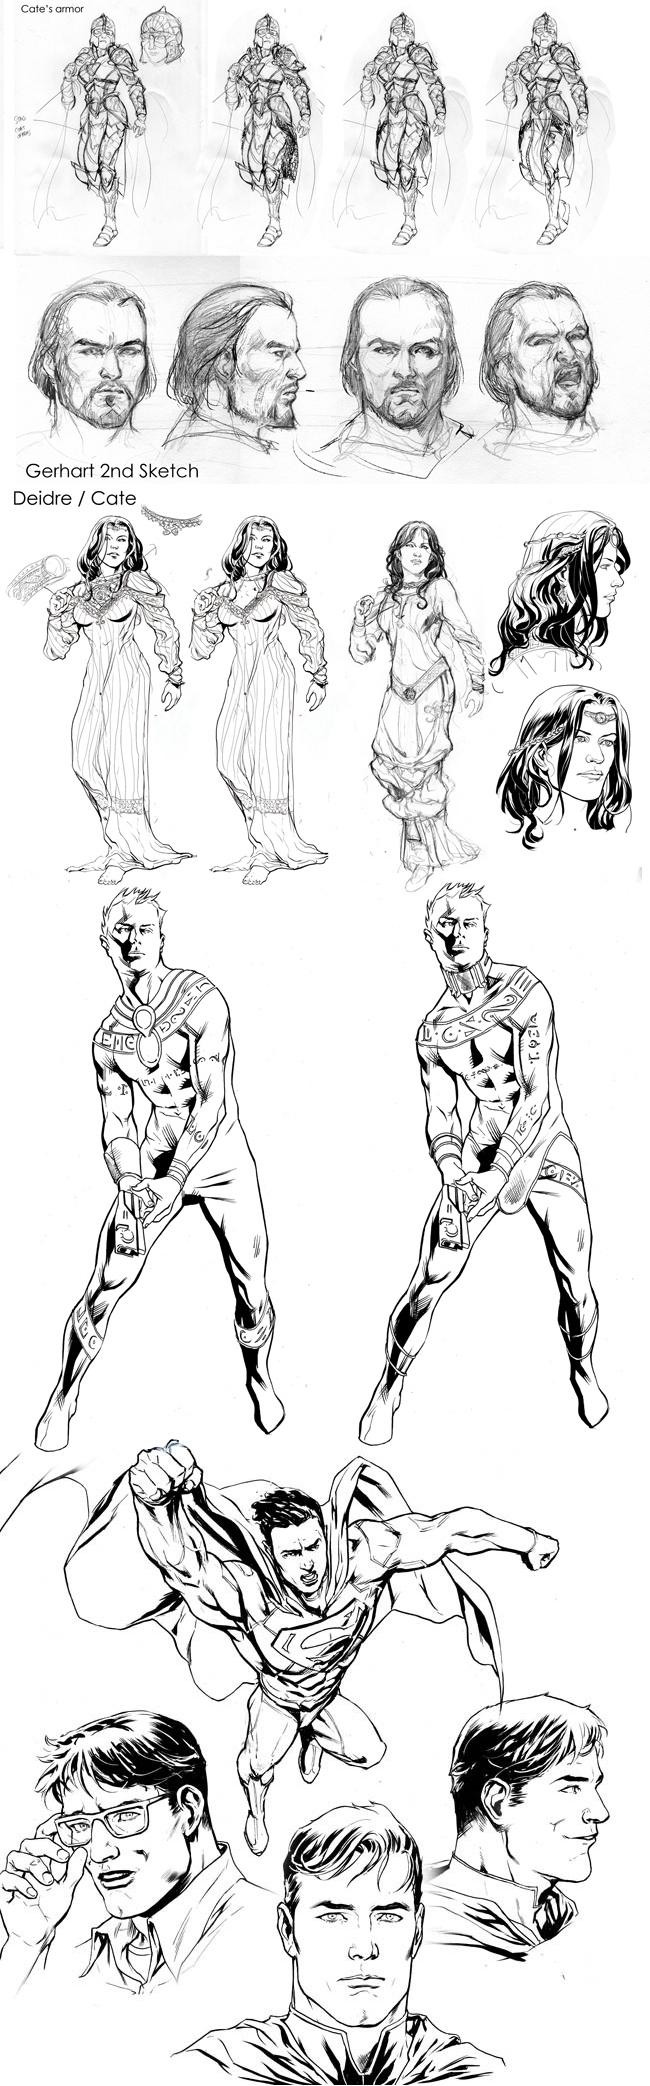 xermanico-profesor-dibujar-comic-dibujo-anatomia-academia-c10-carlos-diez-madrid-curso-cursos-clases-bocetos-apuntes-pintura